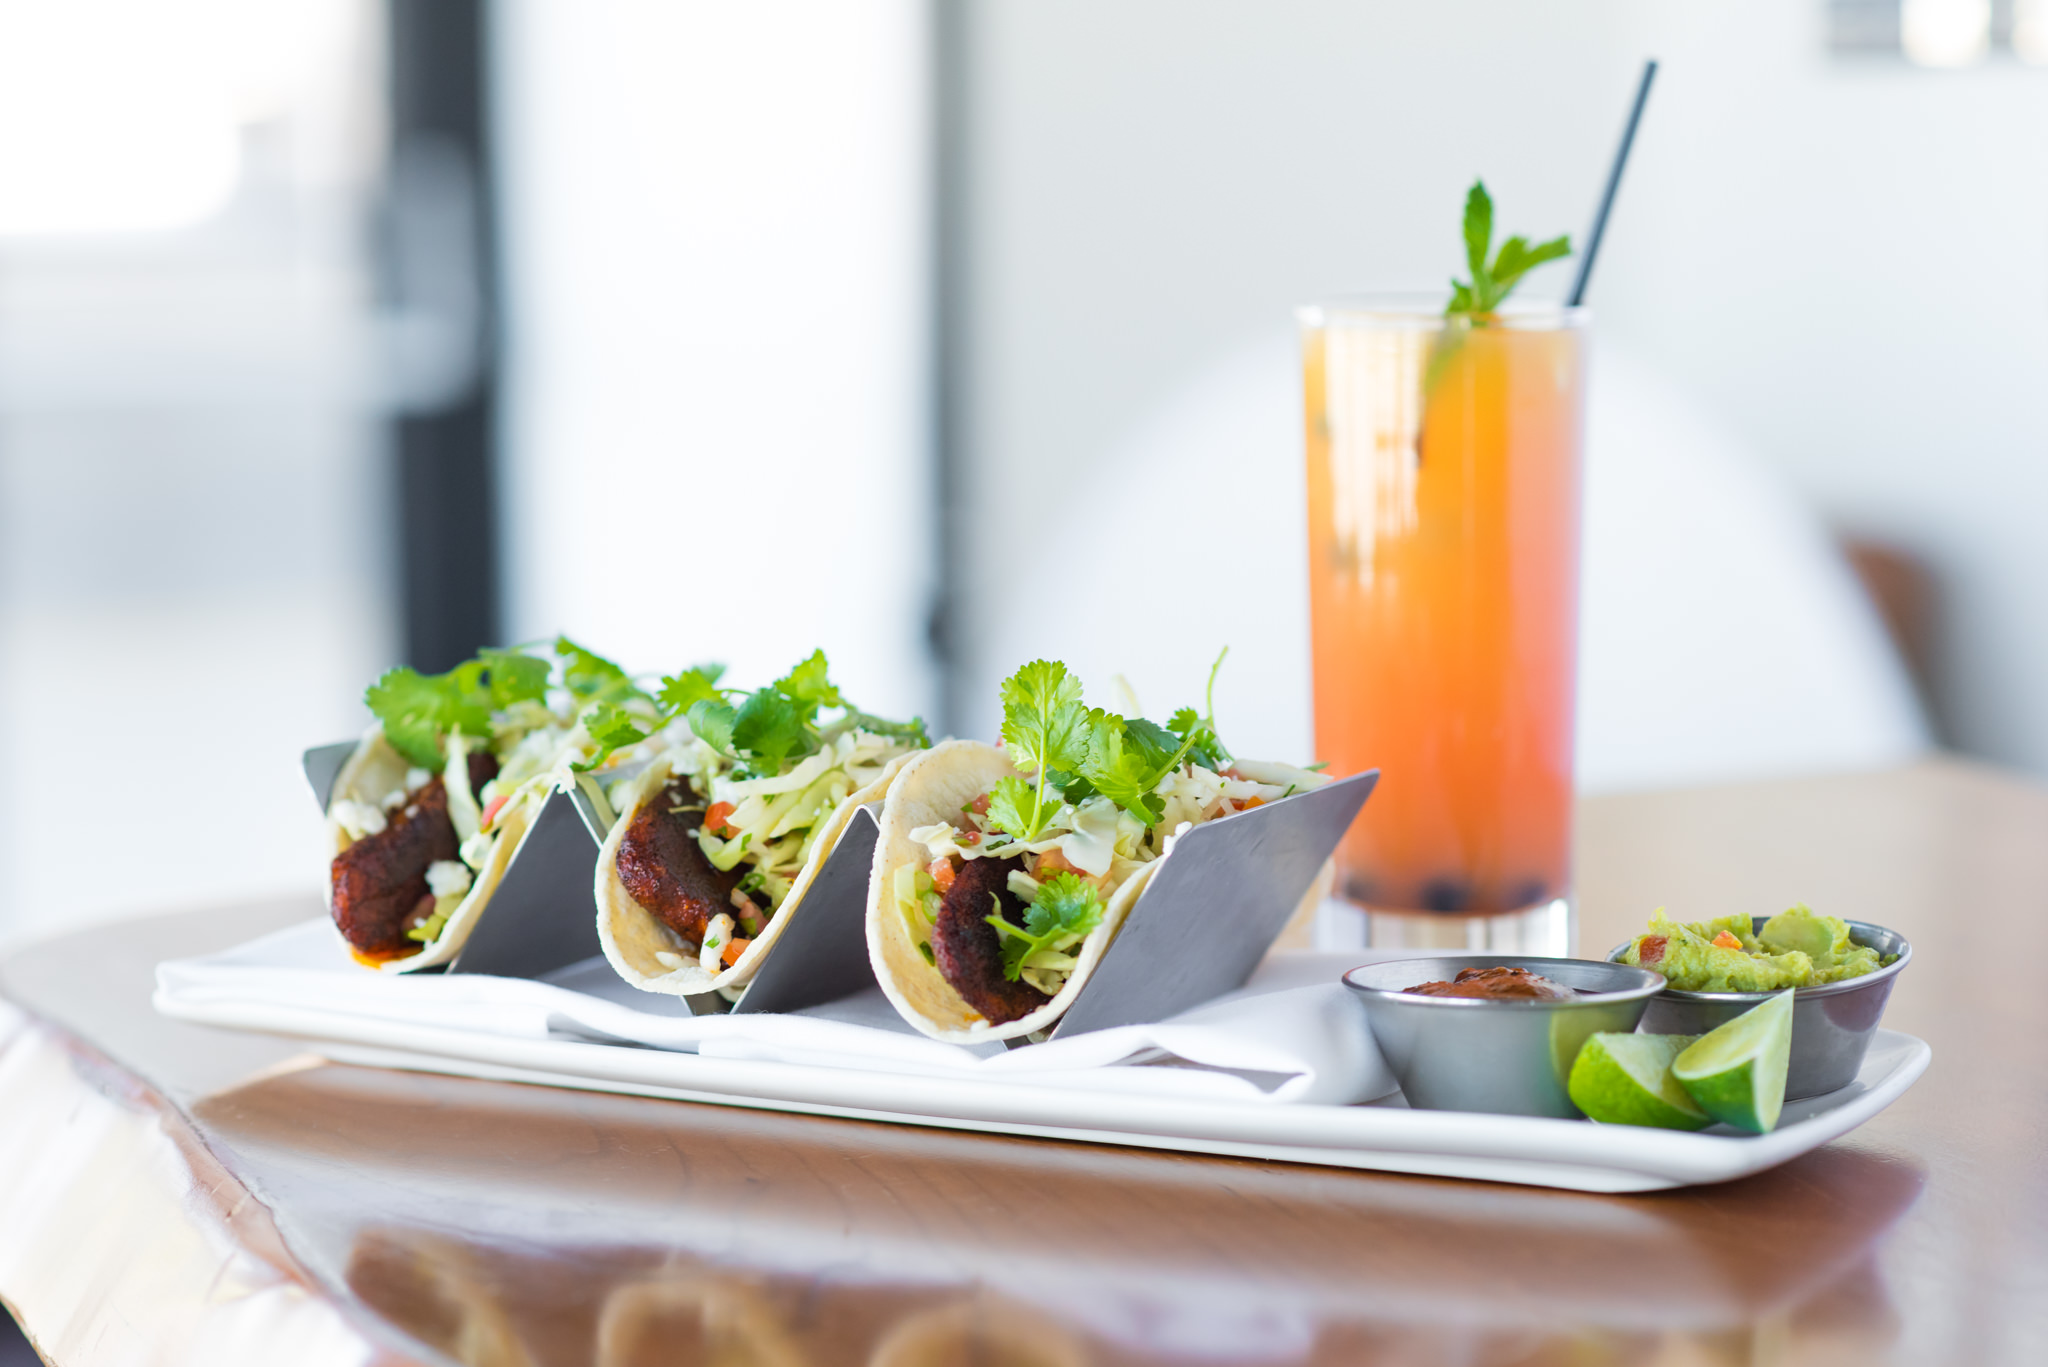 Restaurant - New menus, drinks, and interiors.